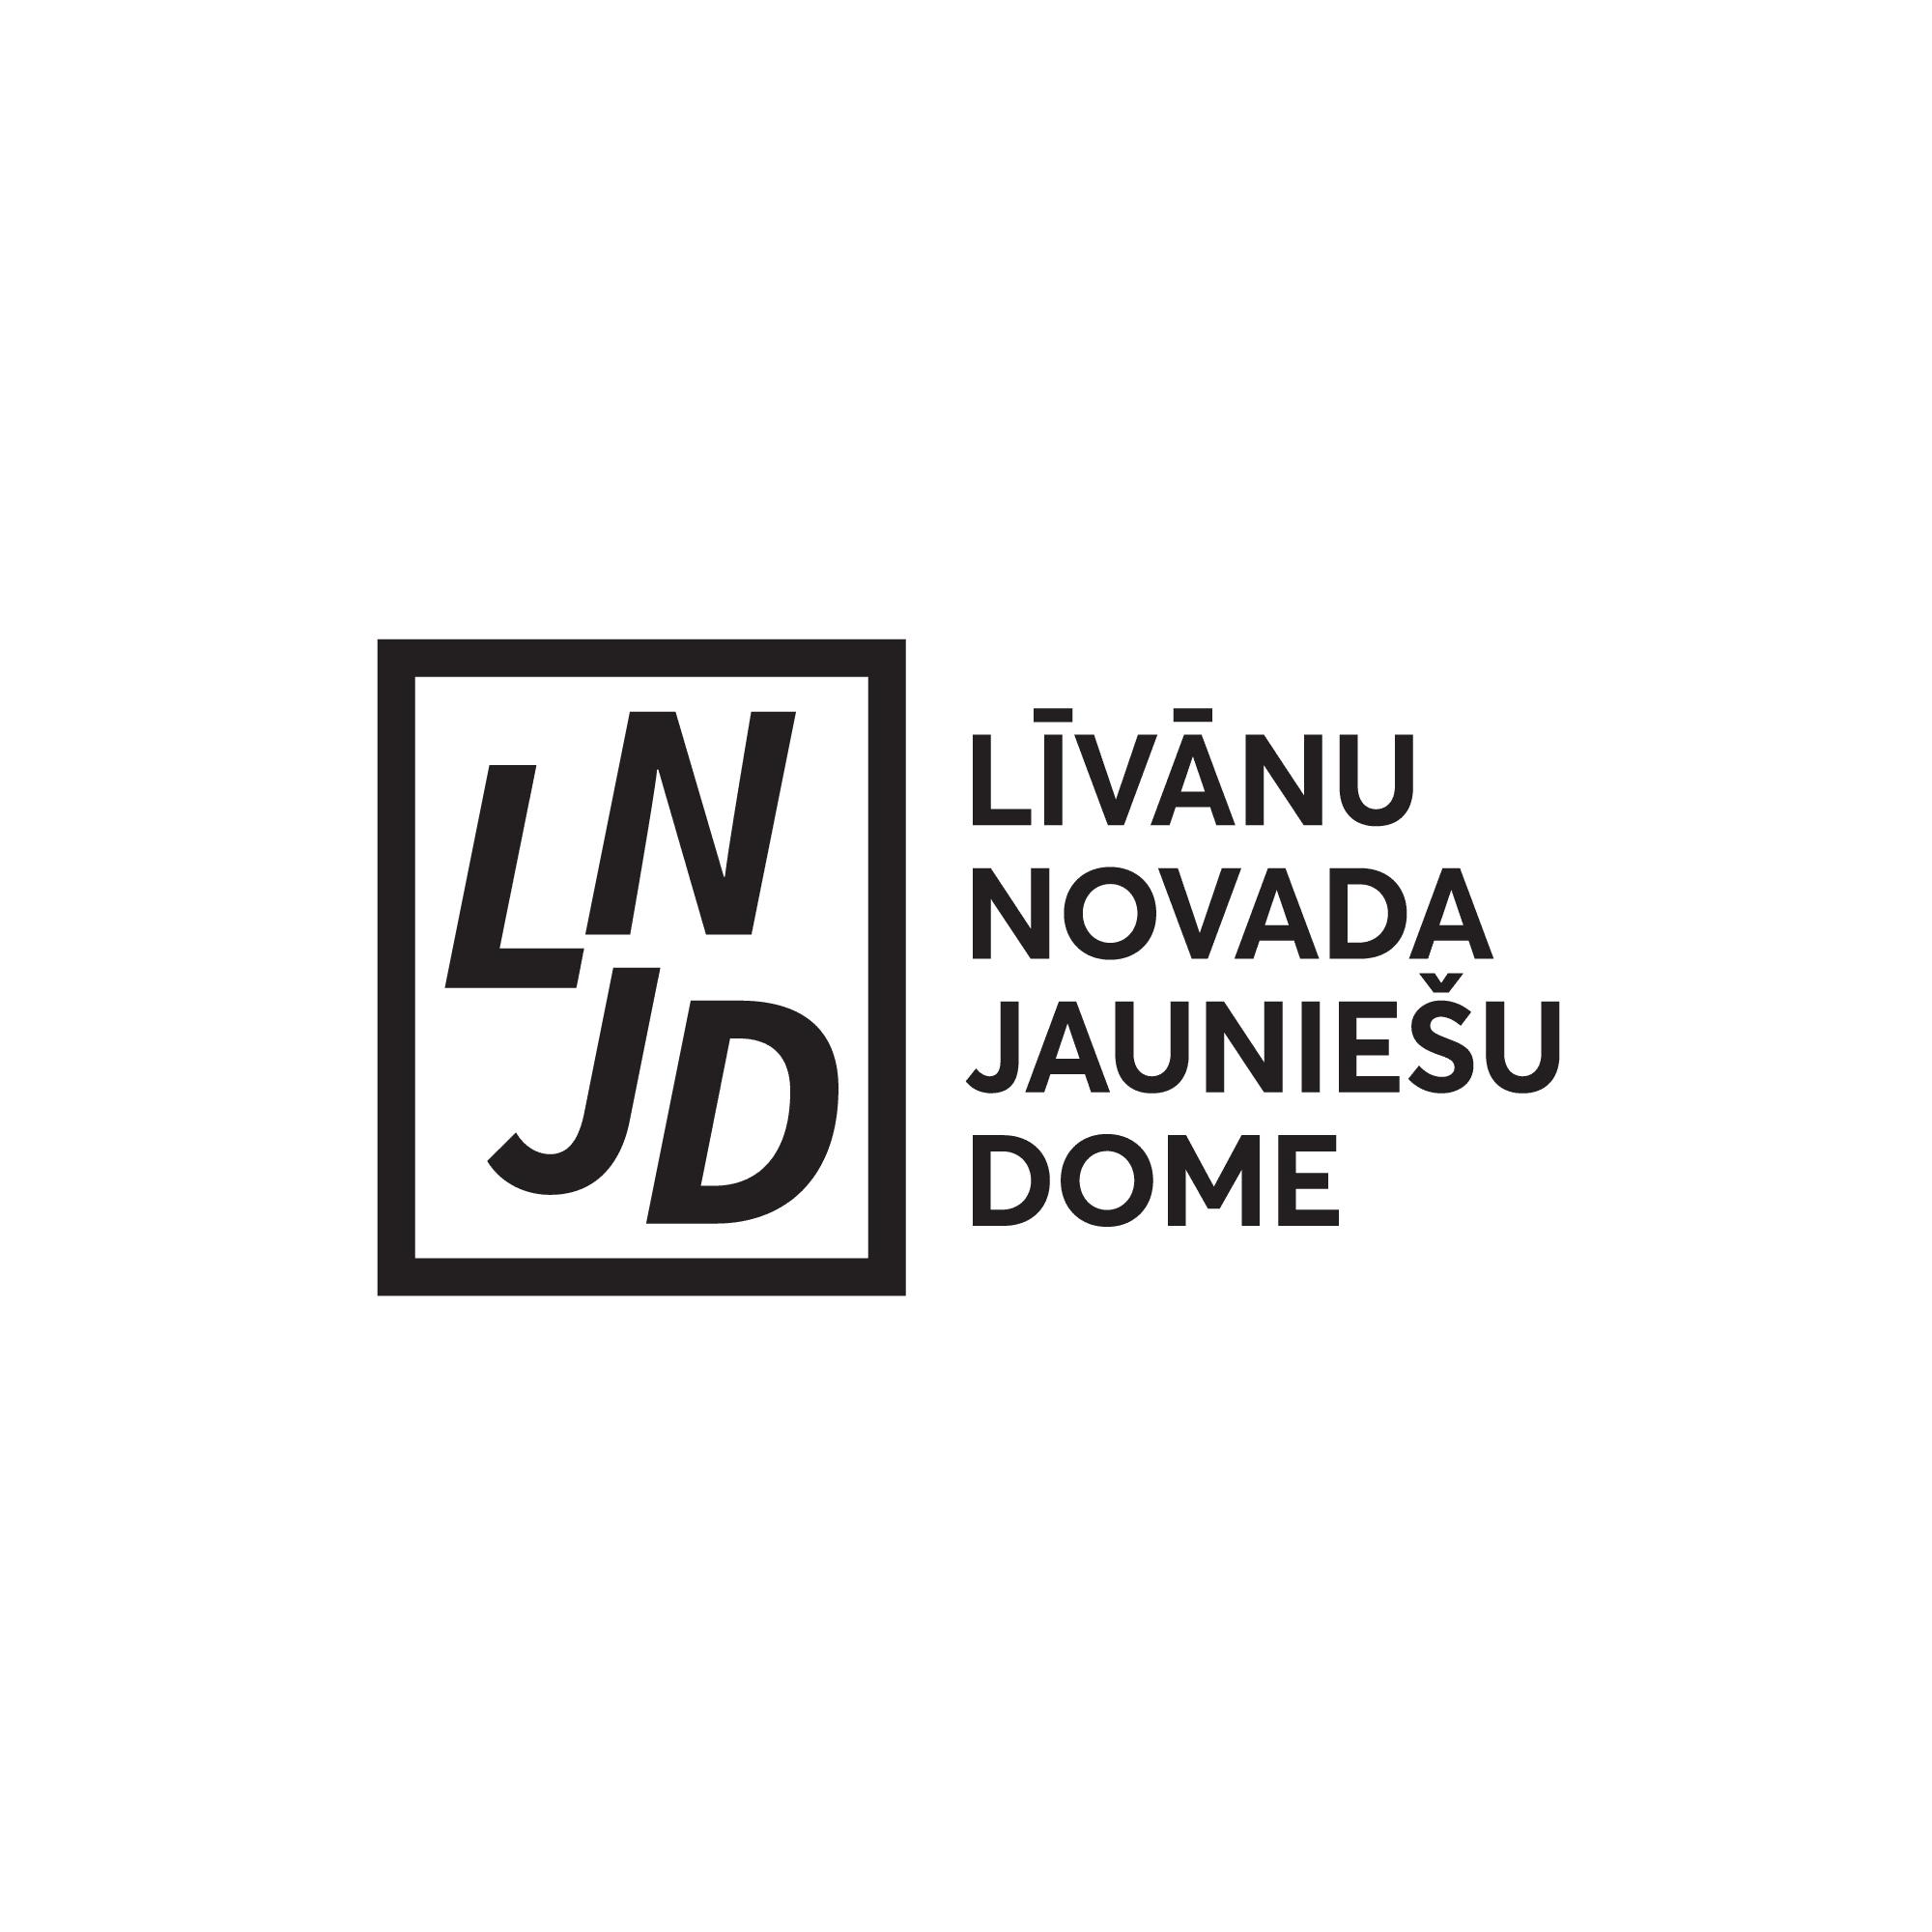 LNJD_logo_k